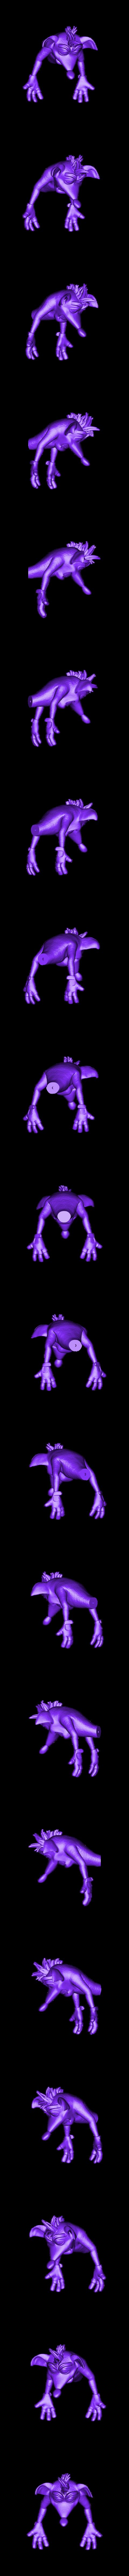 crash_body.stl Download STL file Crash Bandicoot hold Nintendo Switch • 3D print model, emanuelsko